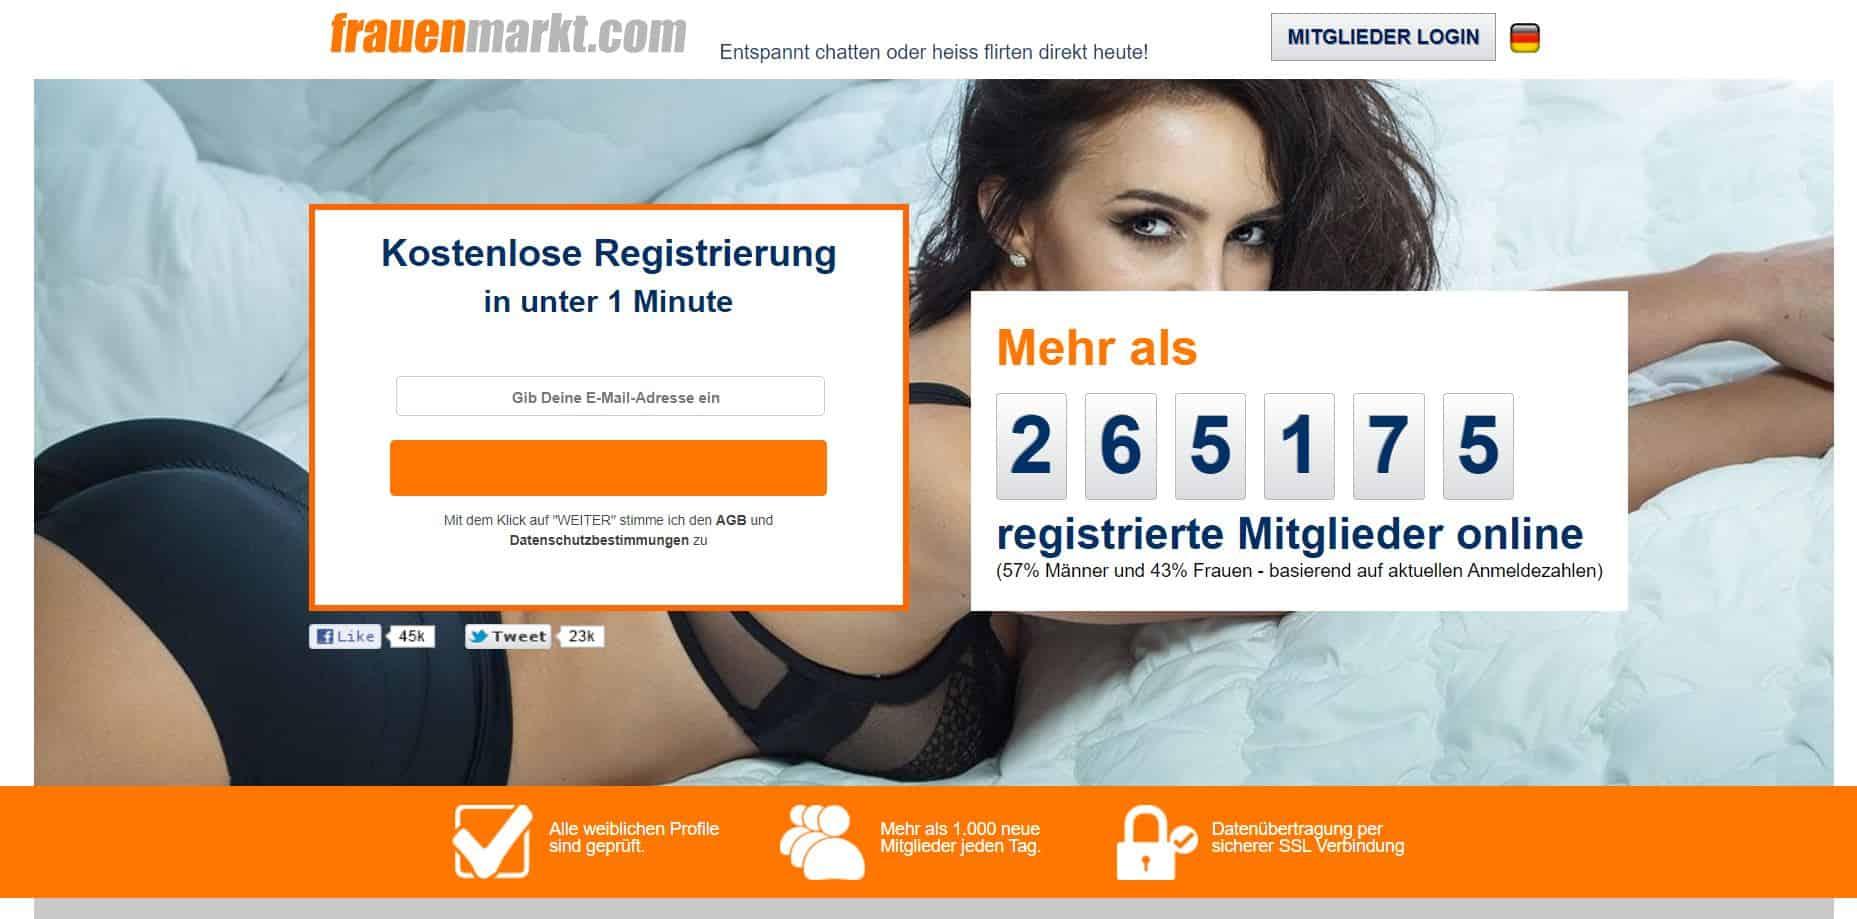 Testbericht - frauenmarkt.com Abzocke